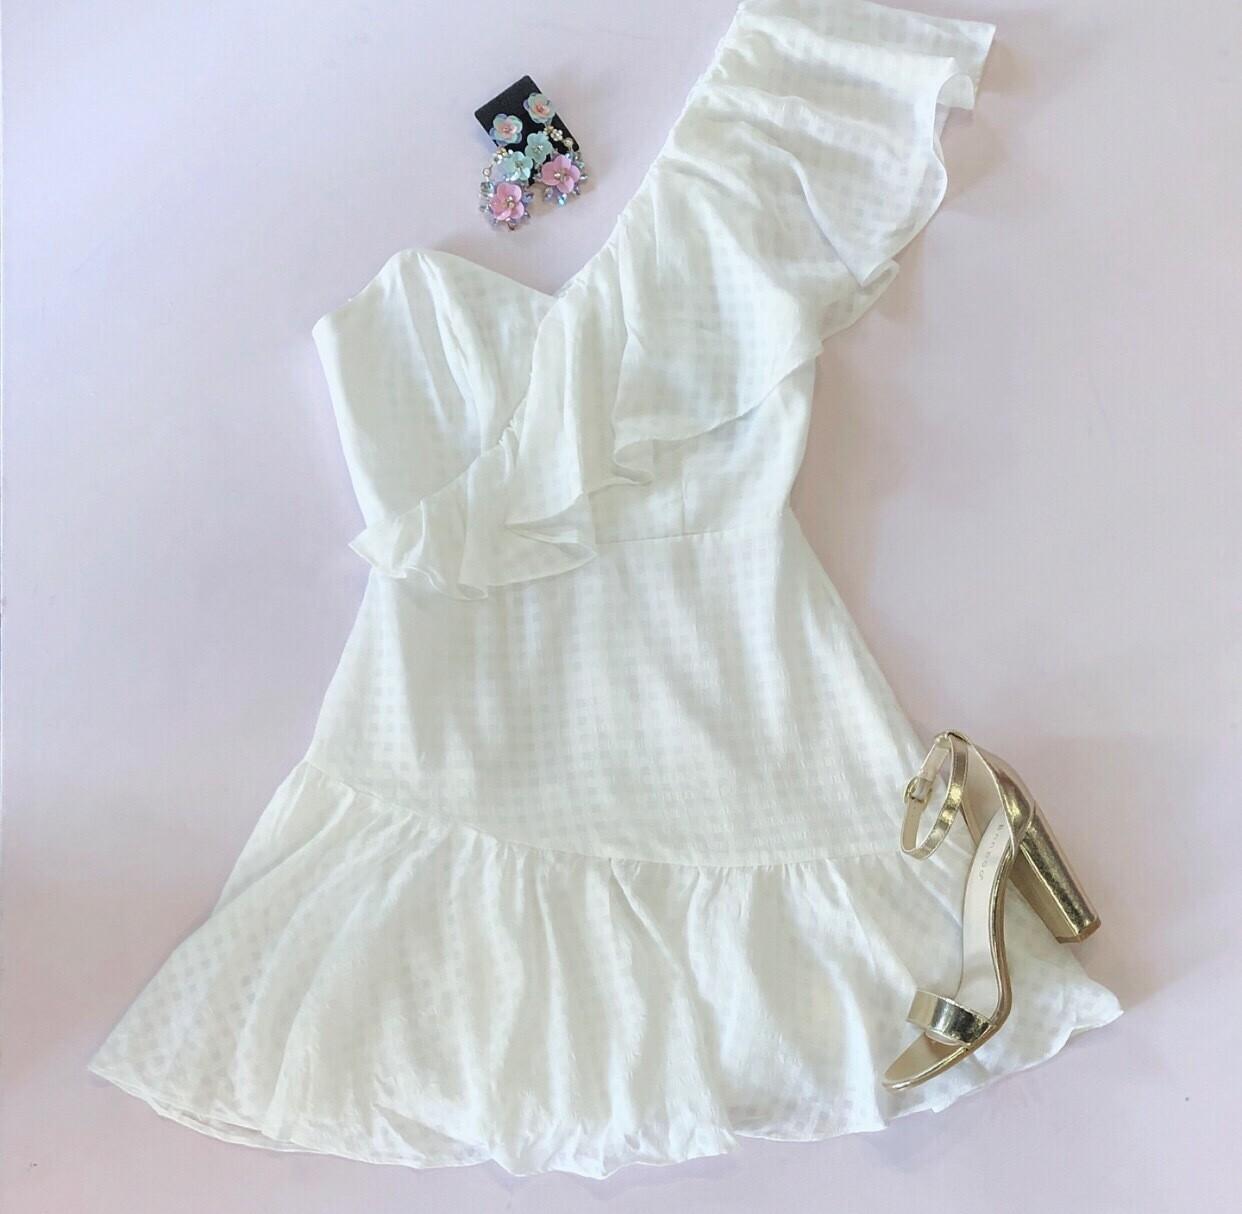 White One Shoulder Ruffle Dress